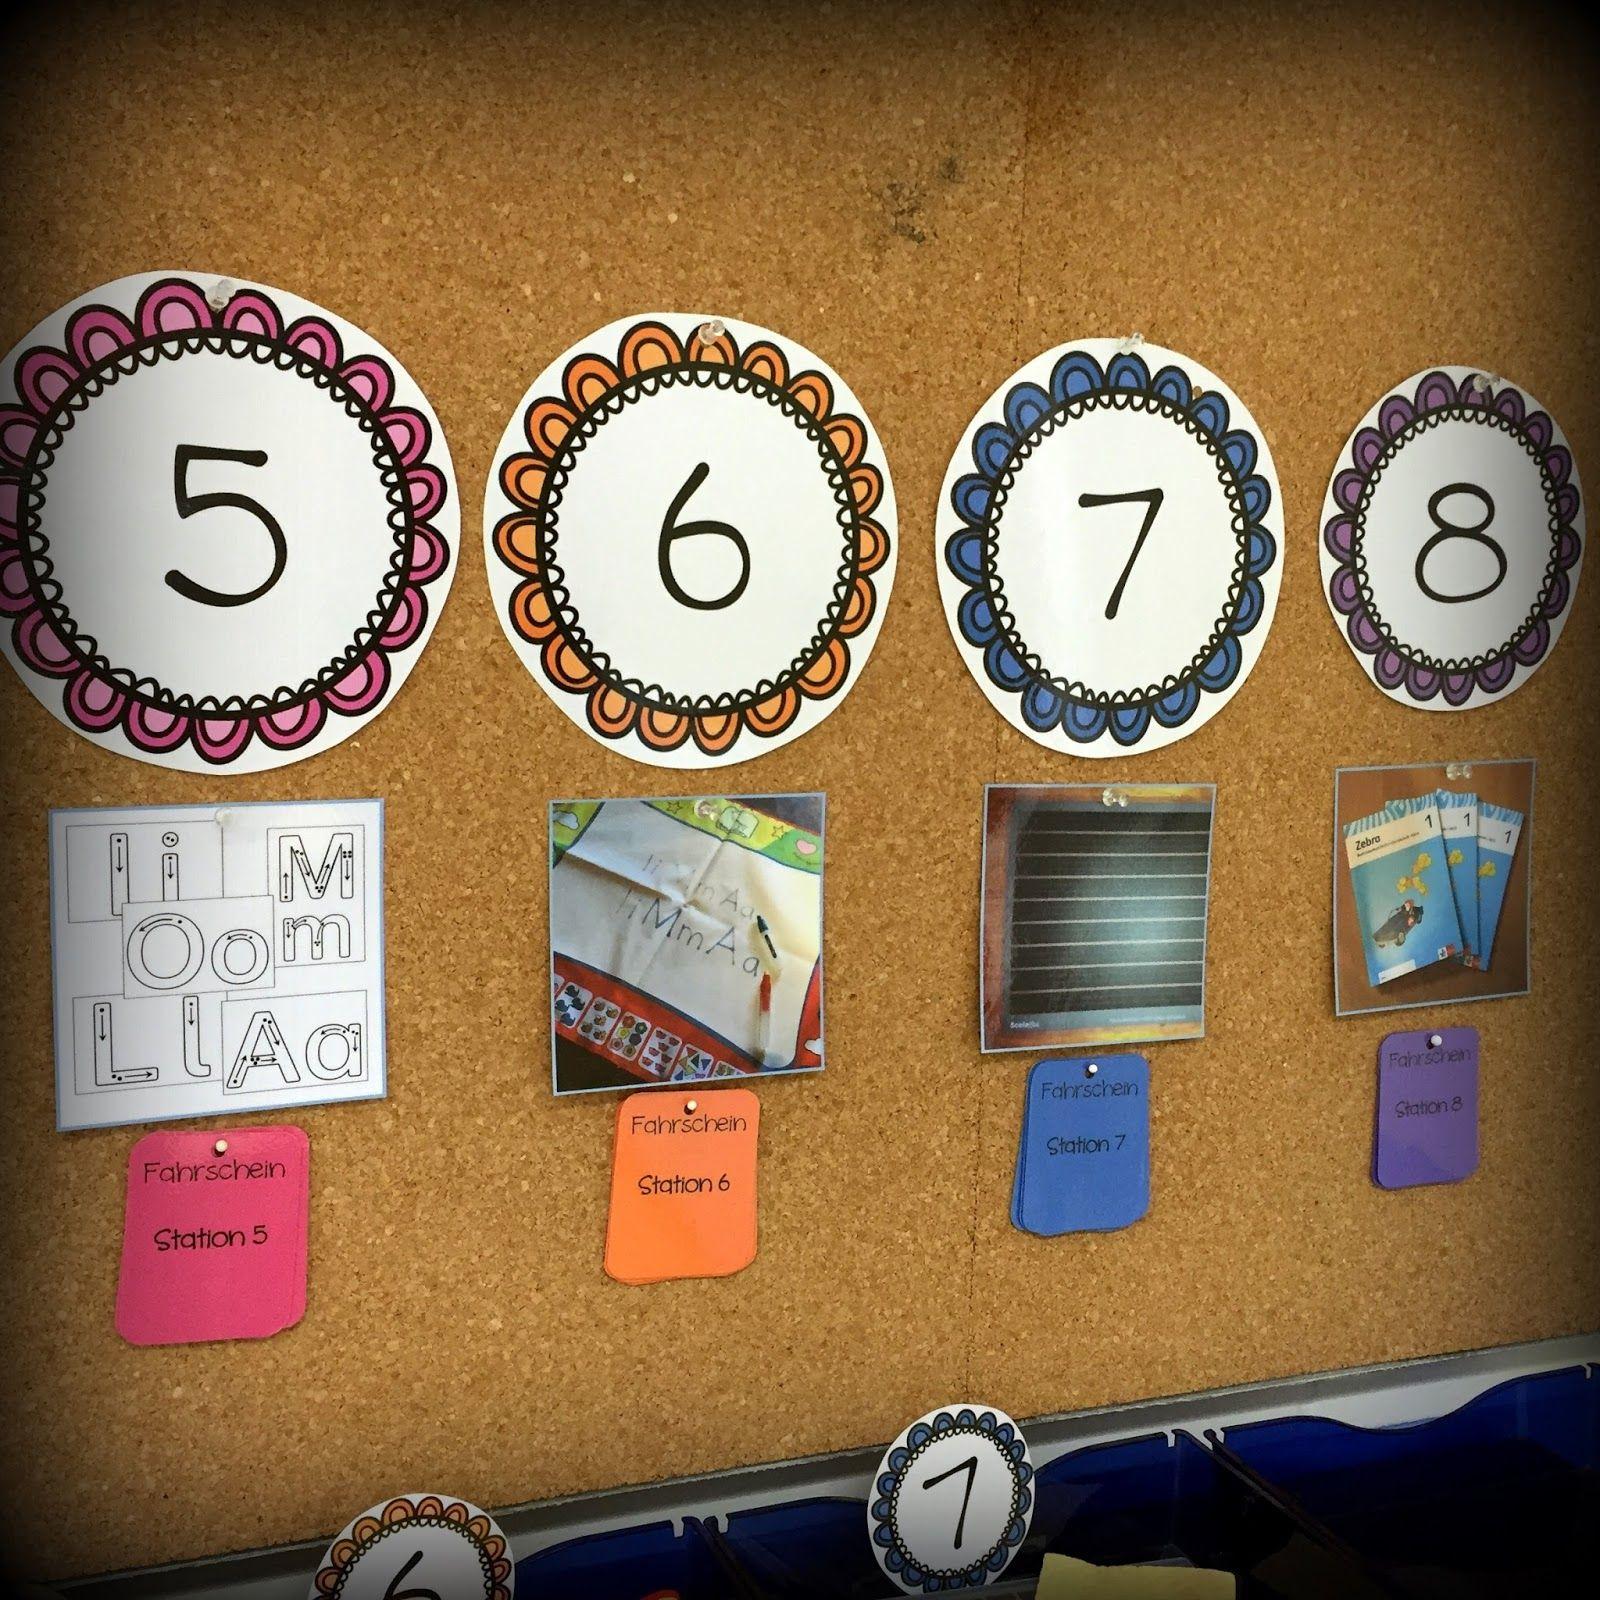 Grundschule Material kostenlos Arbeitsblätter | Klassenzimmer ...